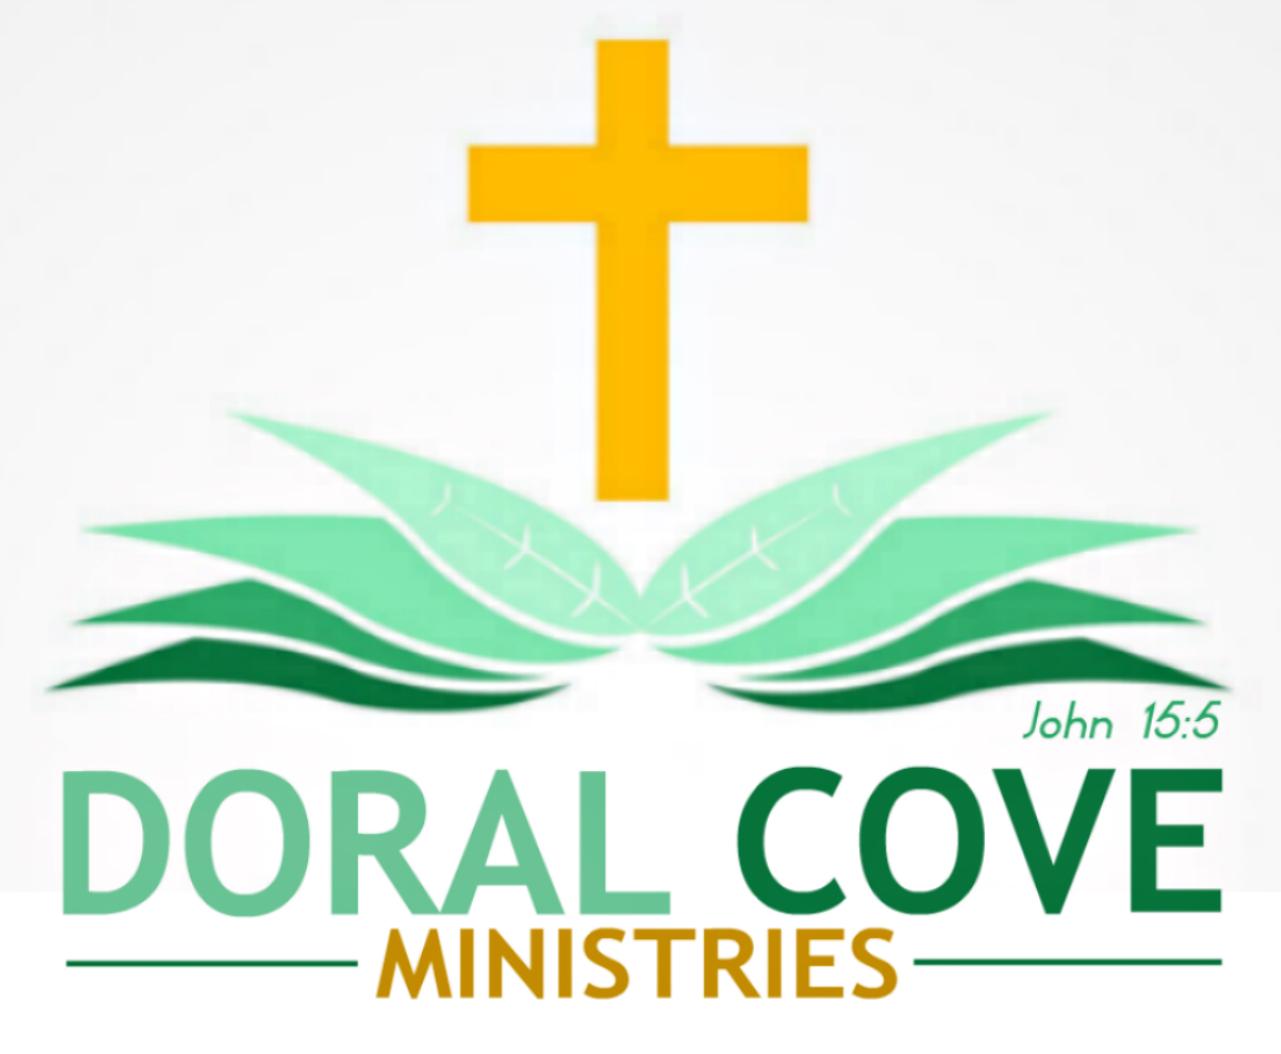 Logo of Doral Cove Ministries